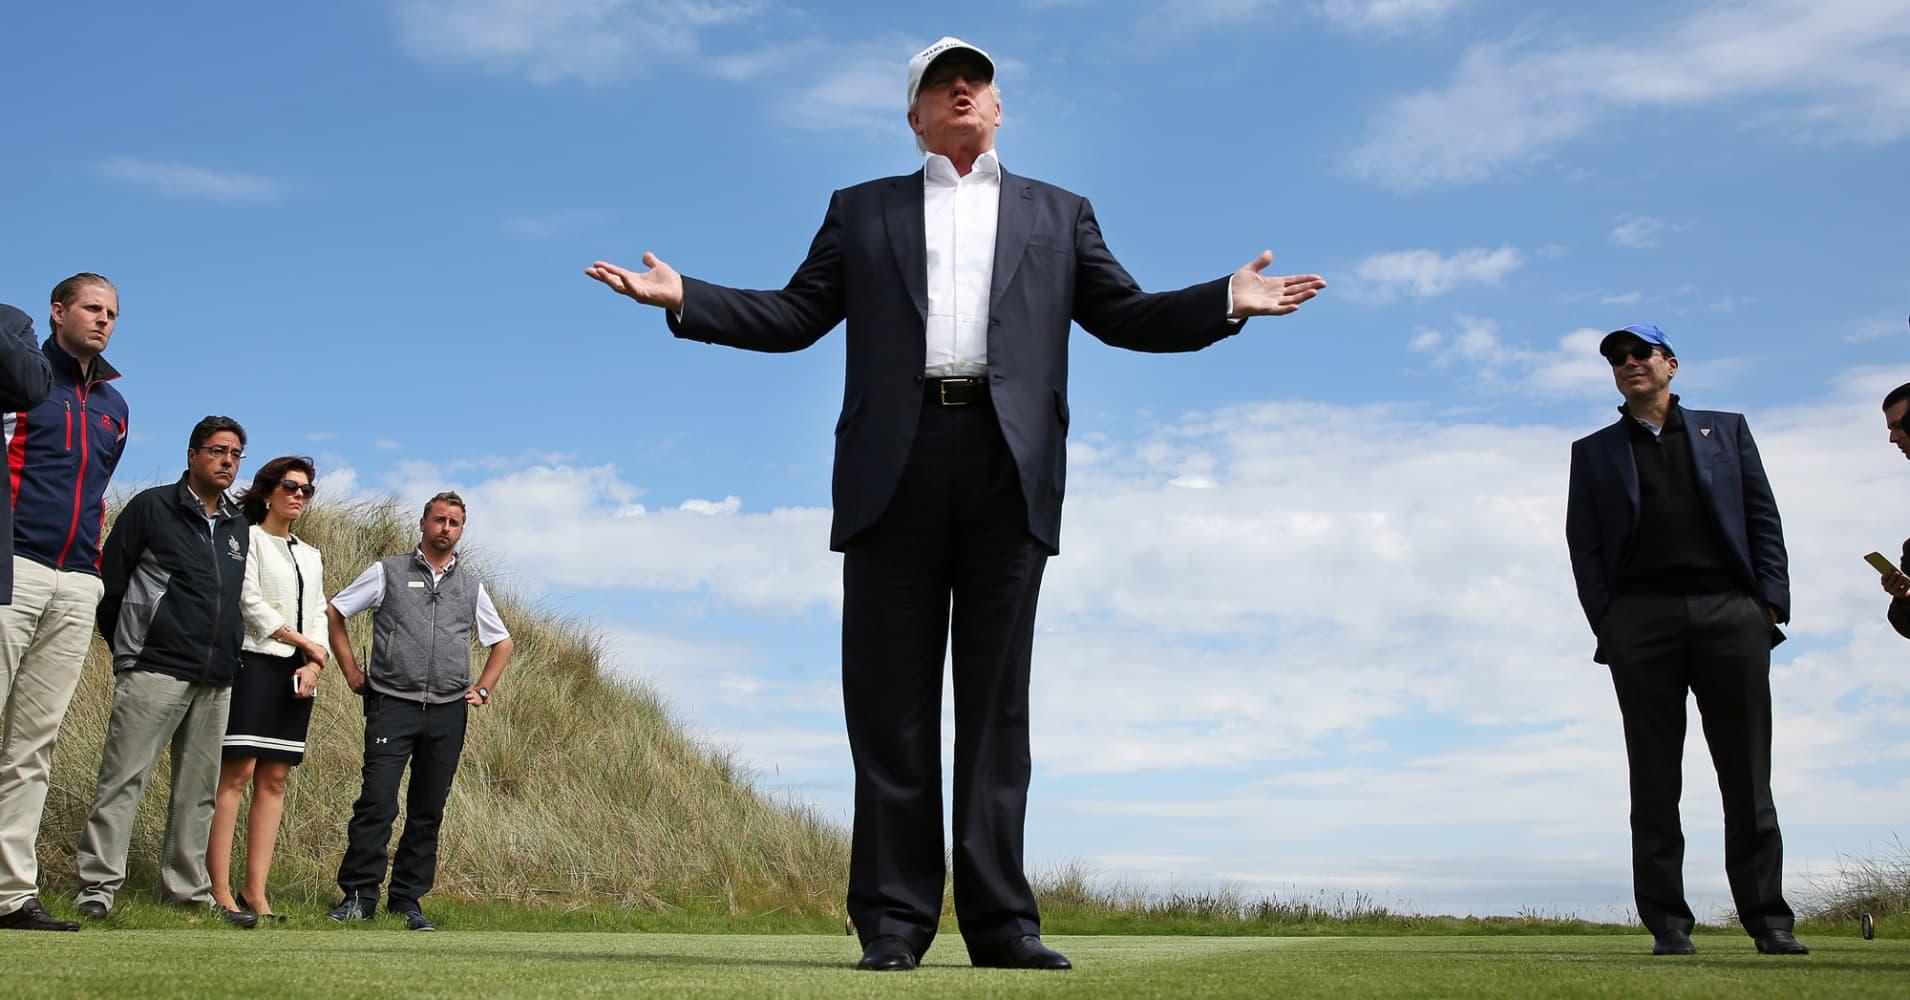 Trump's policies won't cause recession: Economist